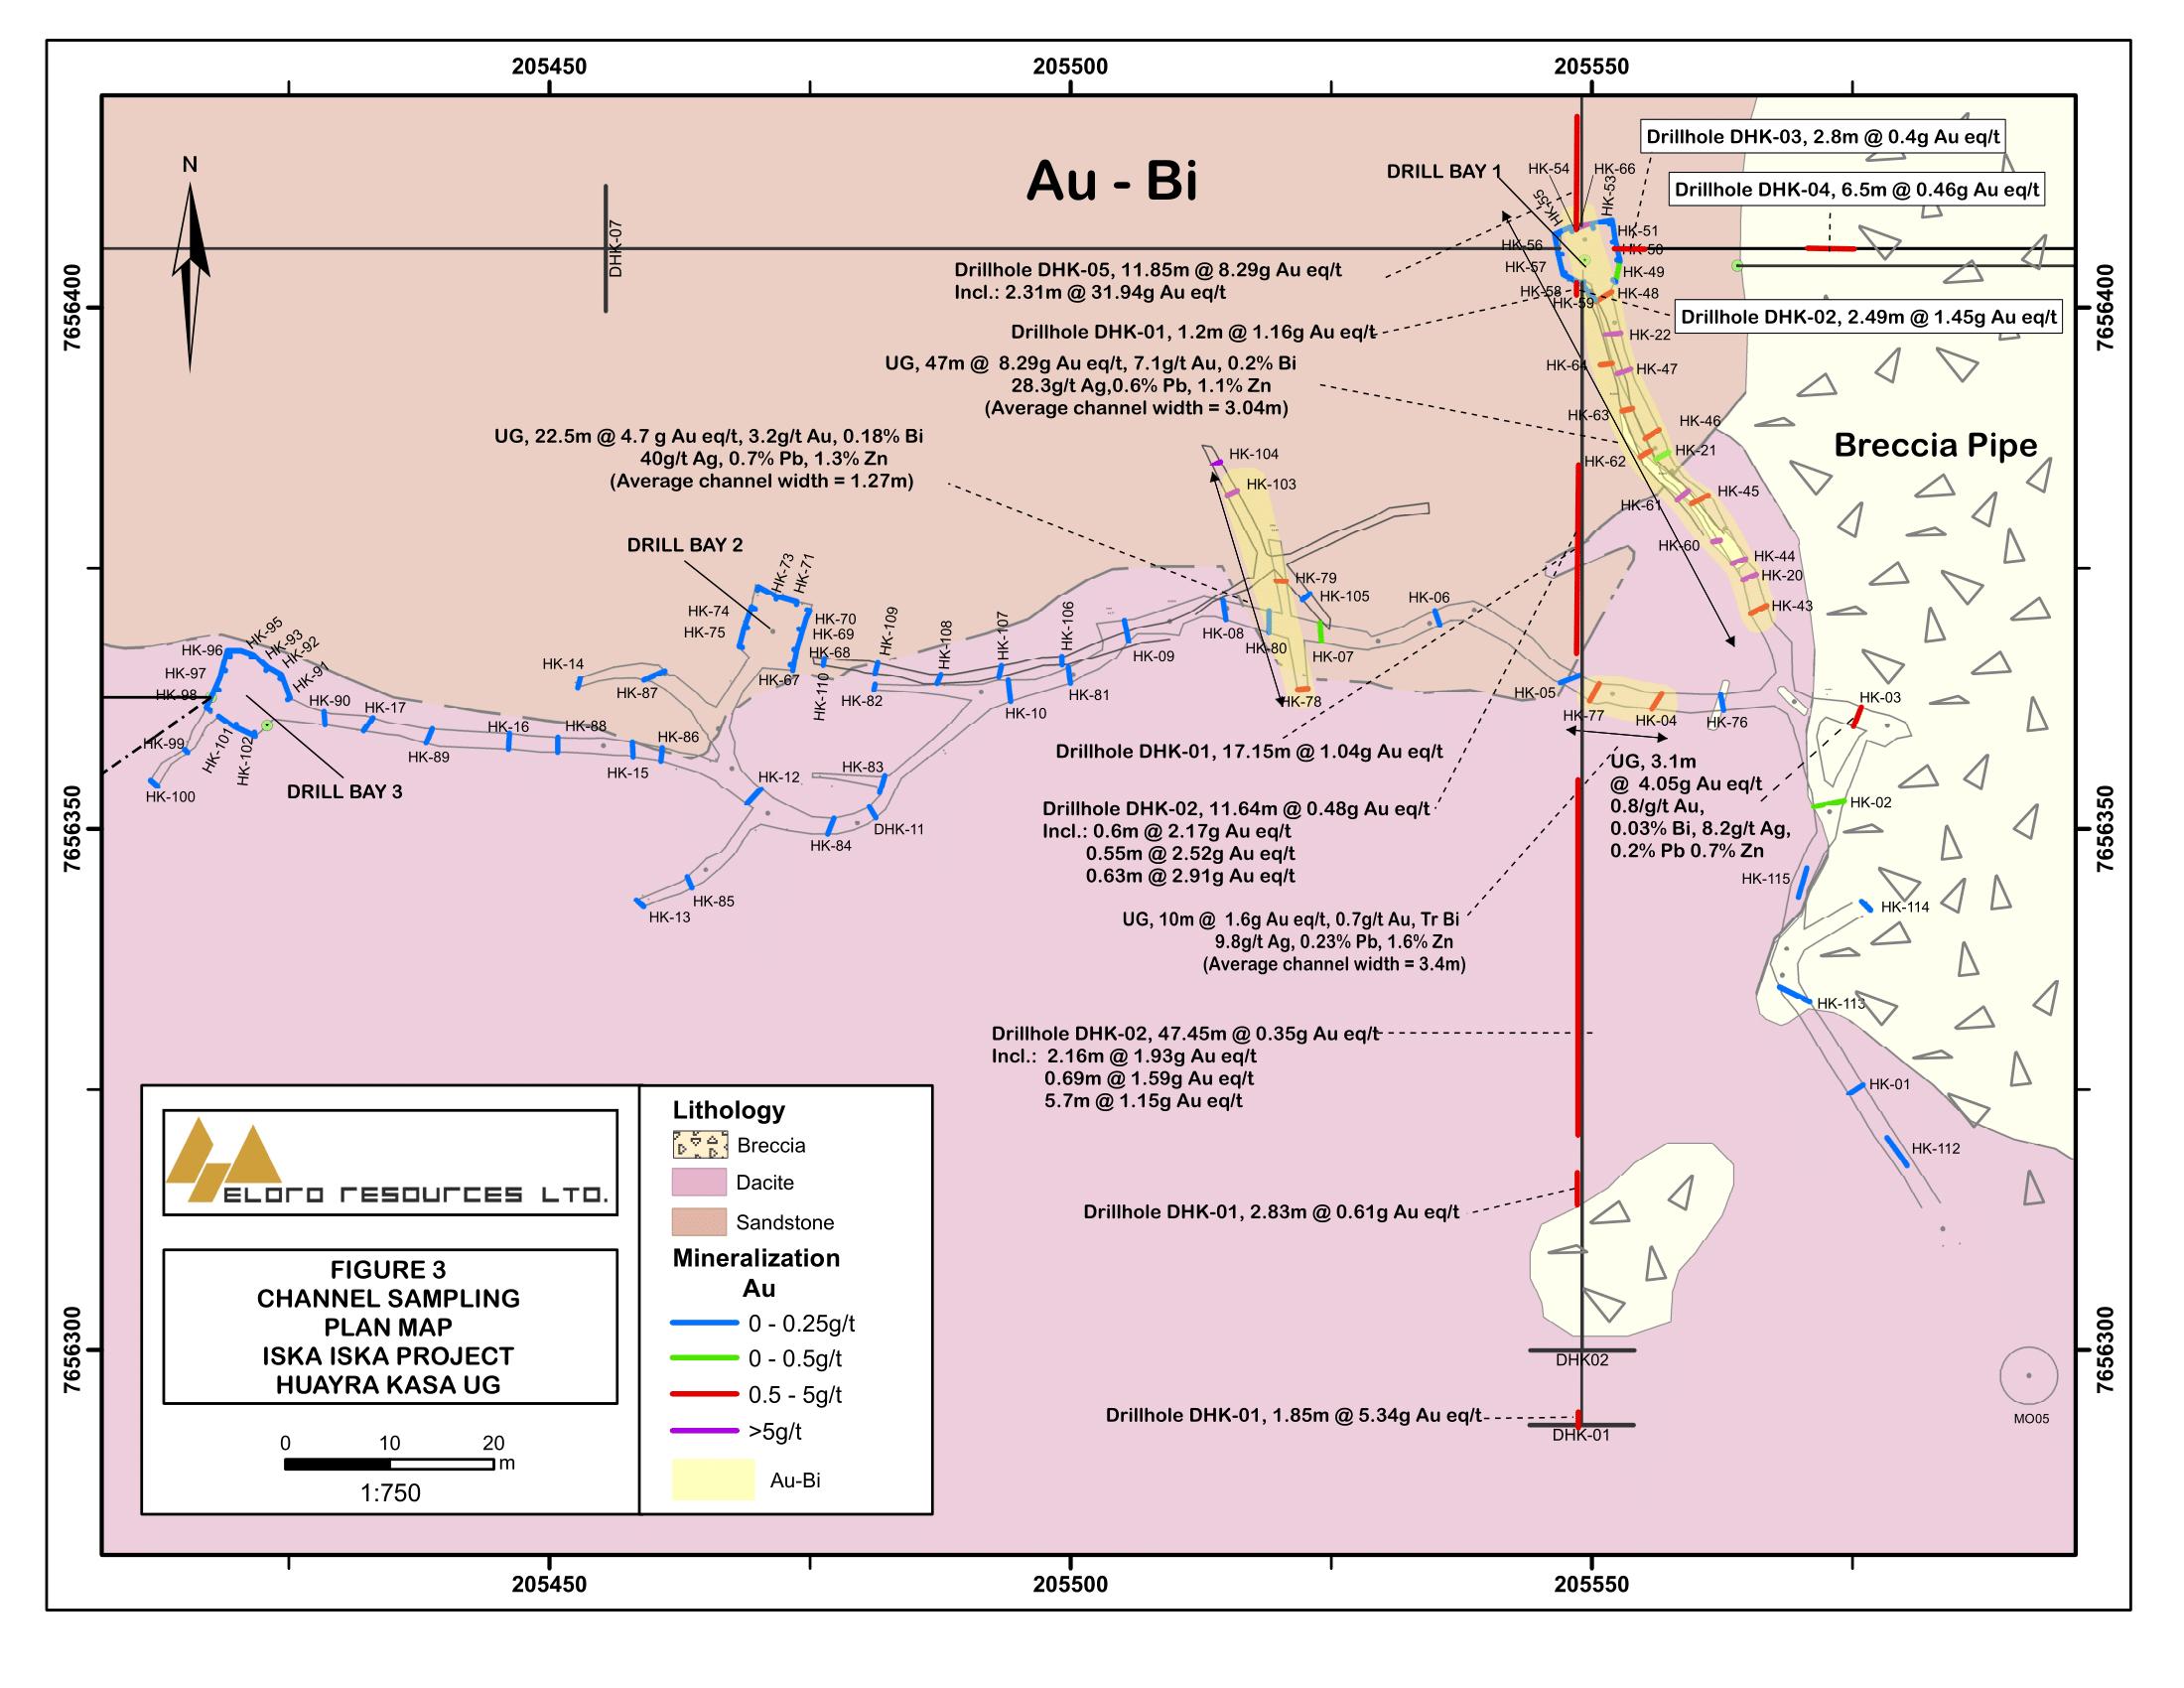 Channel Sampling Plan Map Au-Bi, Huayra Kasa Underground, Iska Iska Project